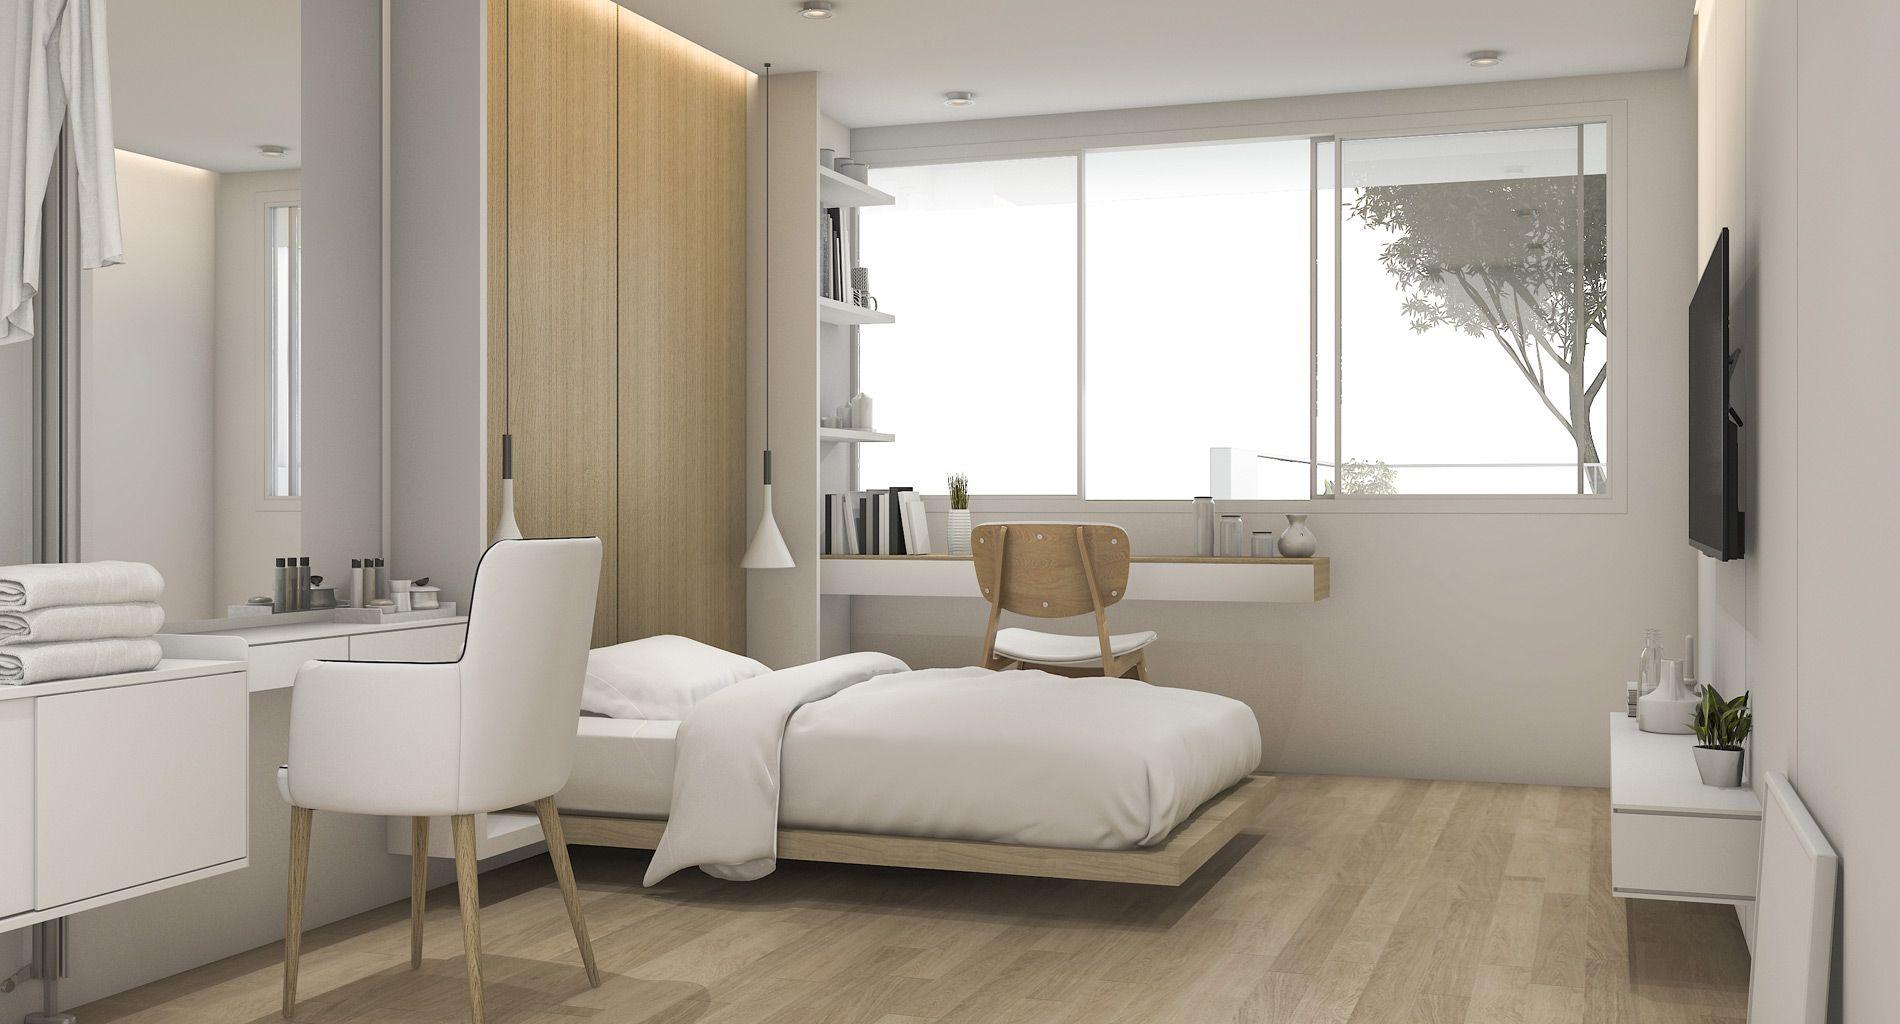 mejores camas plegables